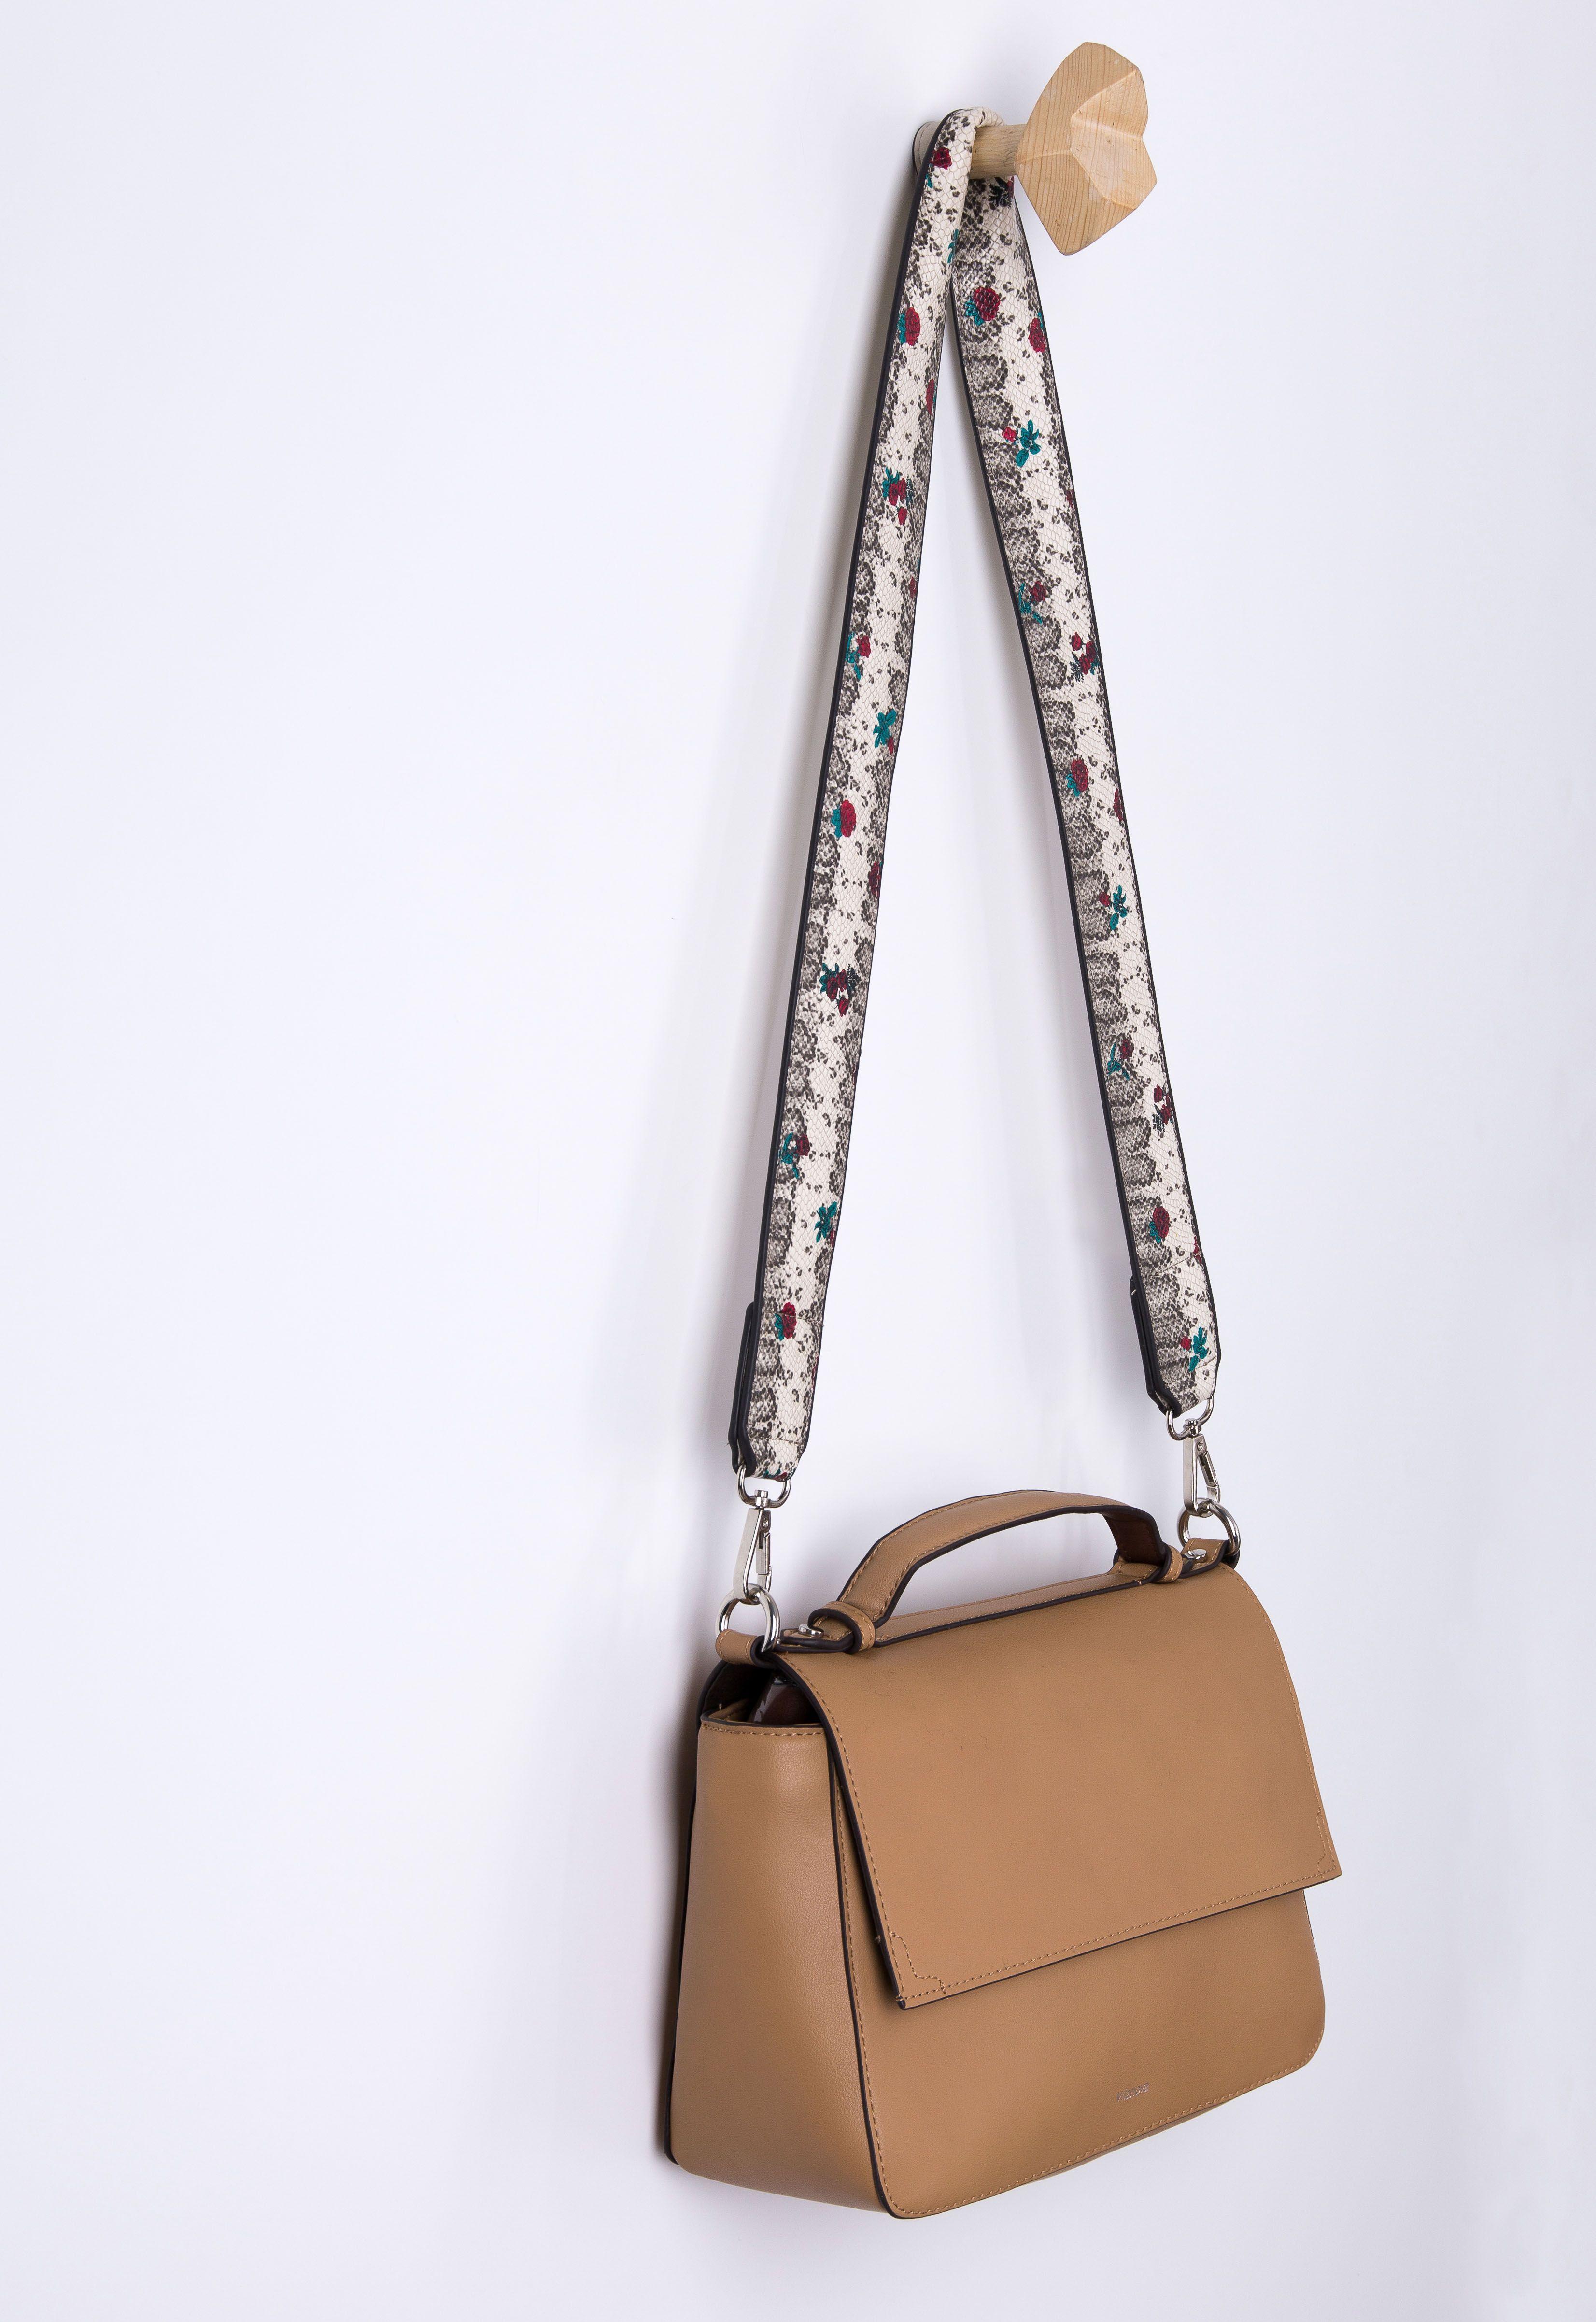 Transform your bag! 1 Strap, 2 Bags